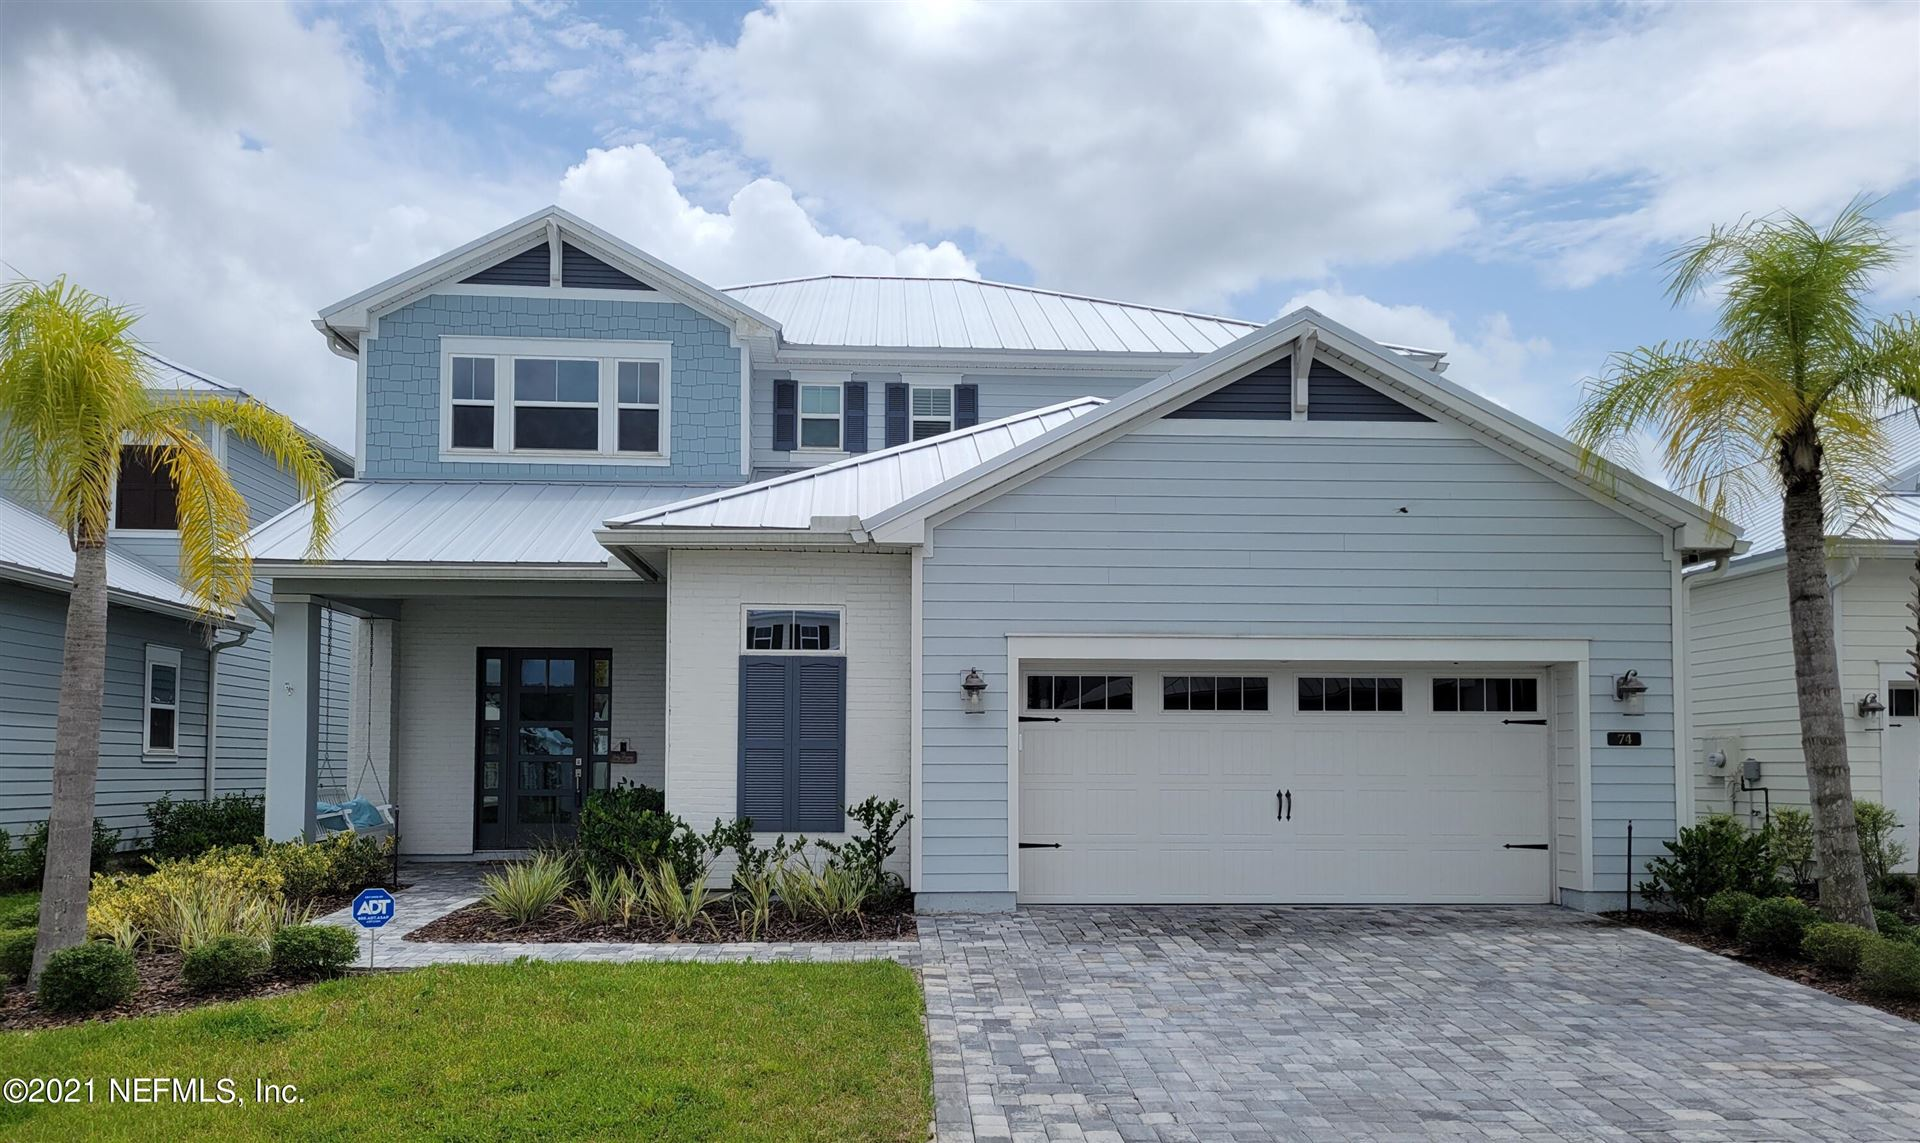 74 WATERLINE DR, Fruit Cove, FL 32259 - MLS#: 1116399